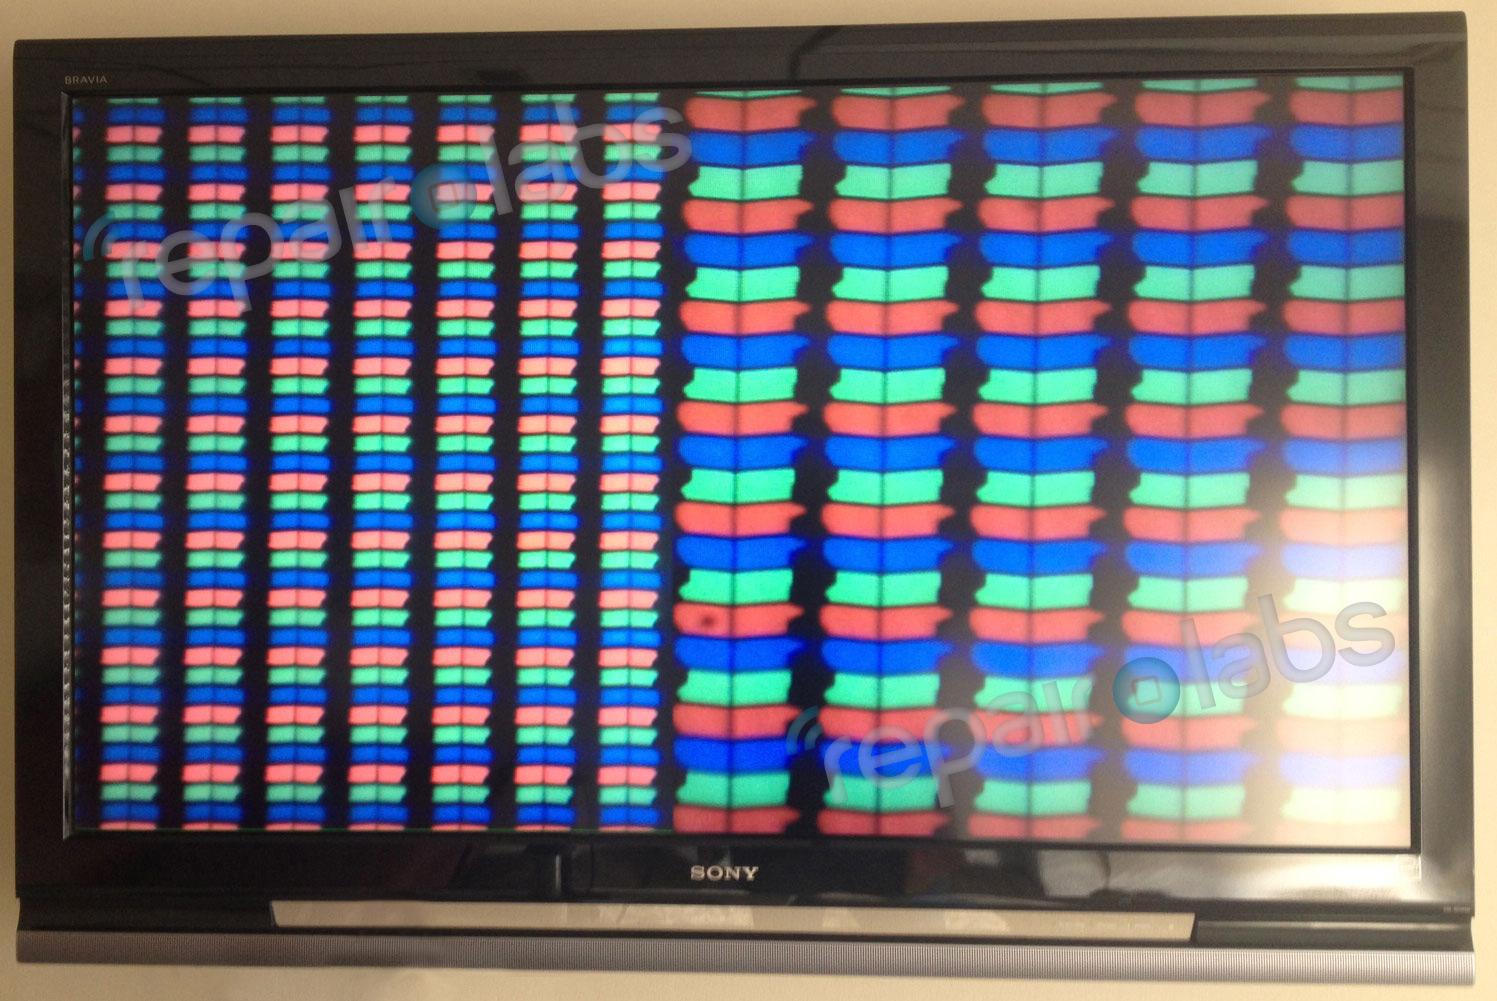 Analysis: iPad mini screen is not Retina, but surpasses that of iPad 2